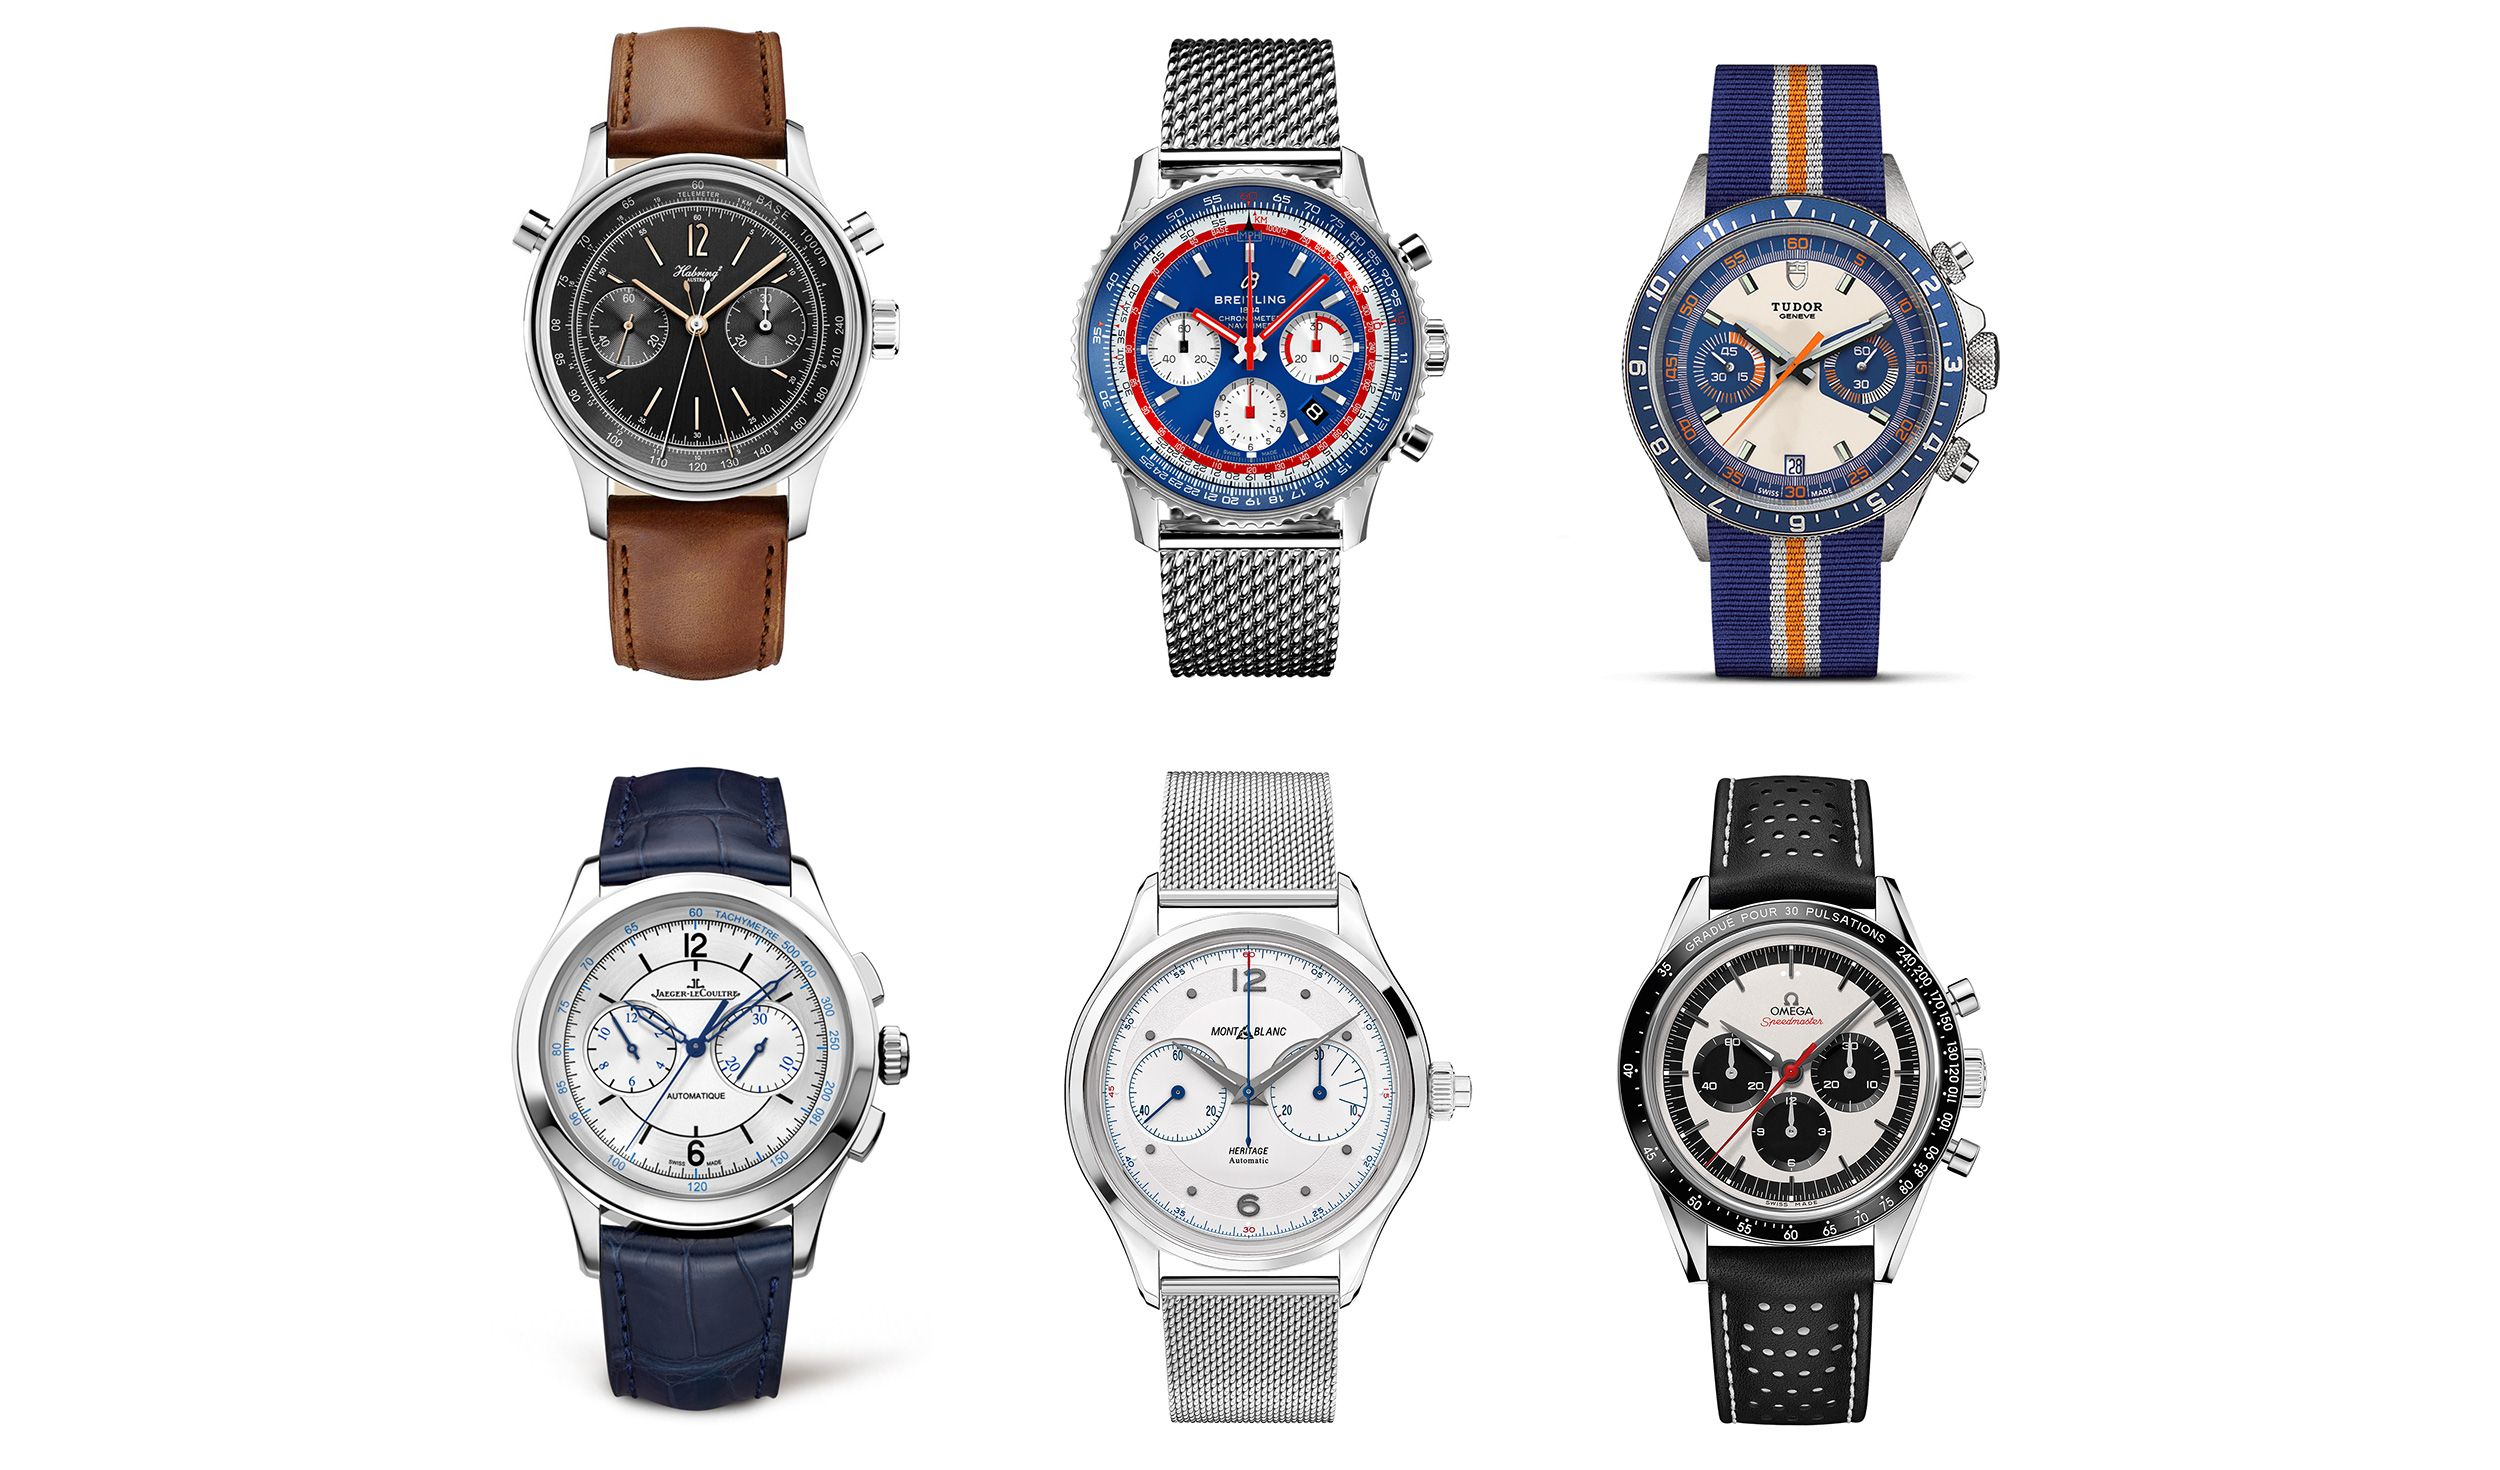 The best chronographs under £10,000